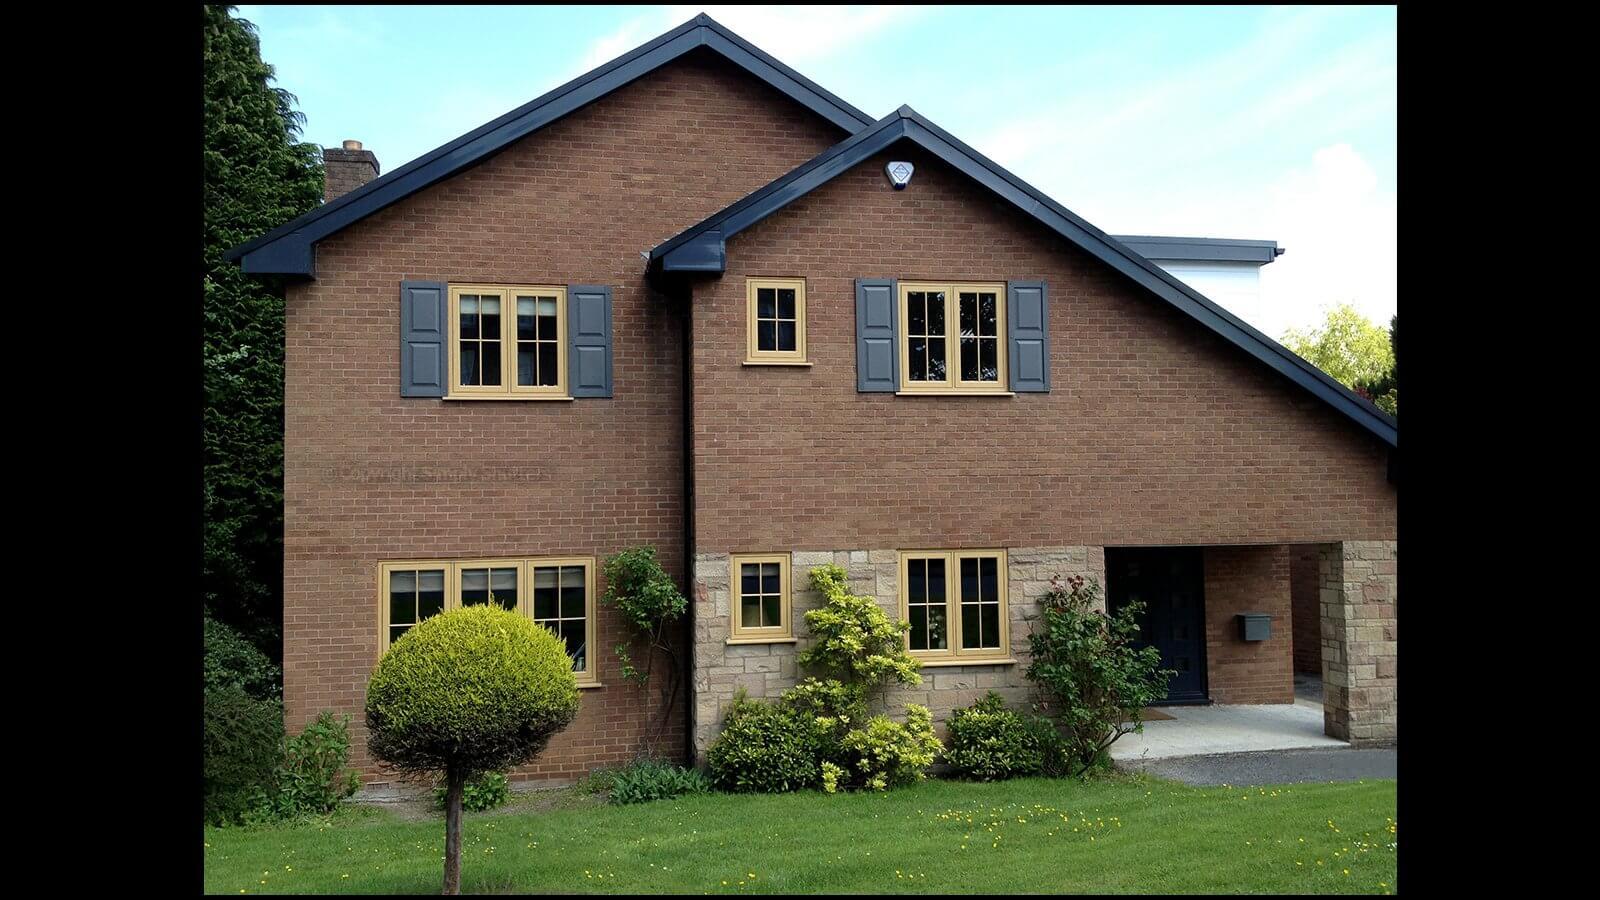 Custom panel decorative exterior window shutters - Decorative window shutters exterior ...